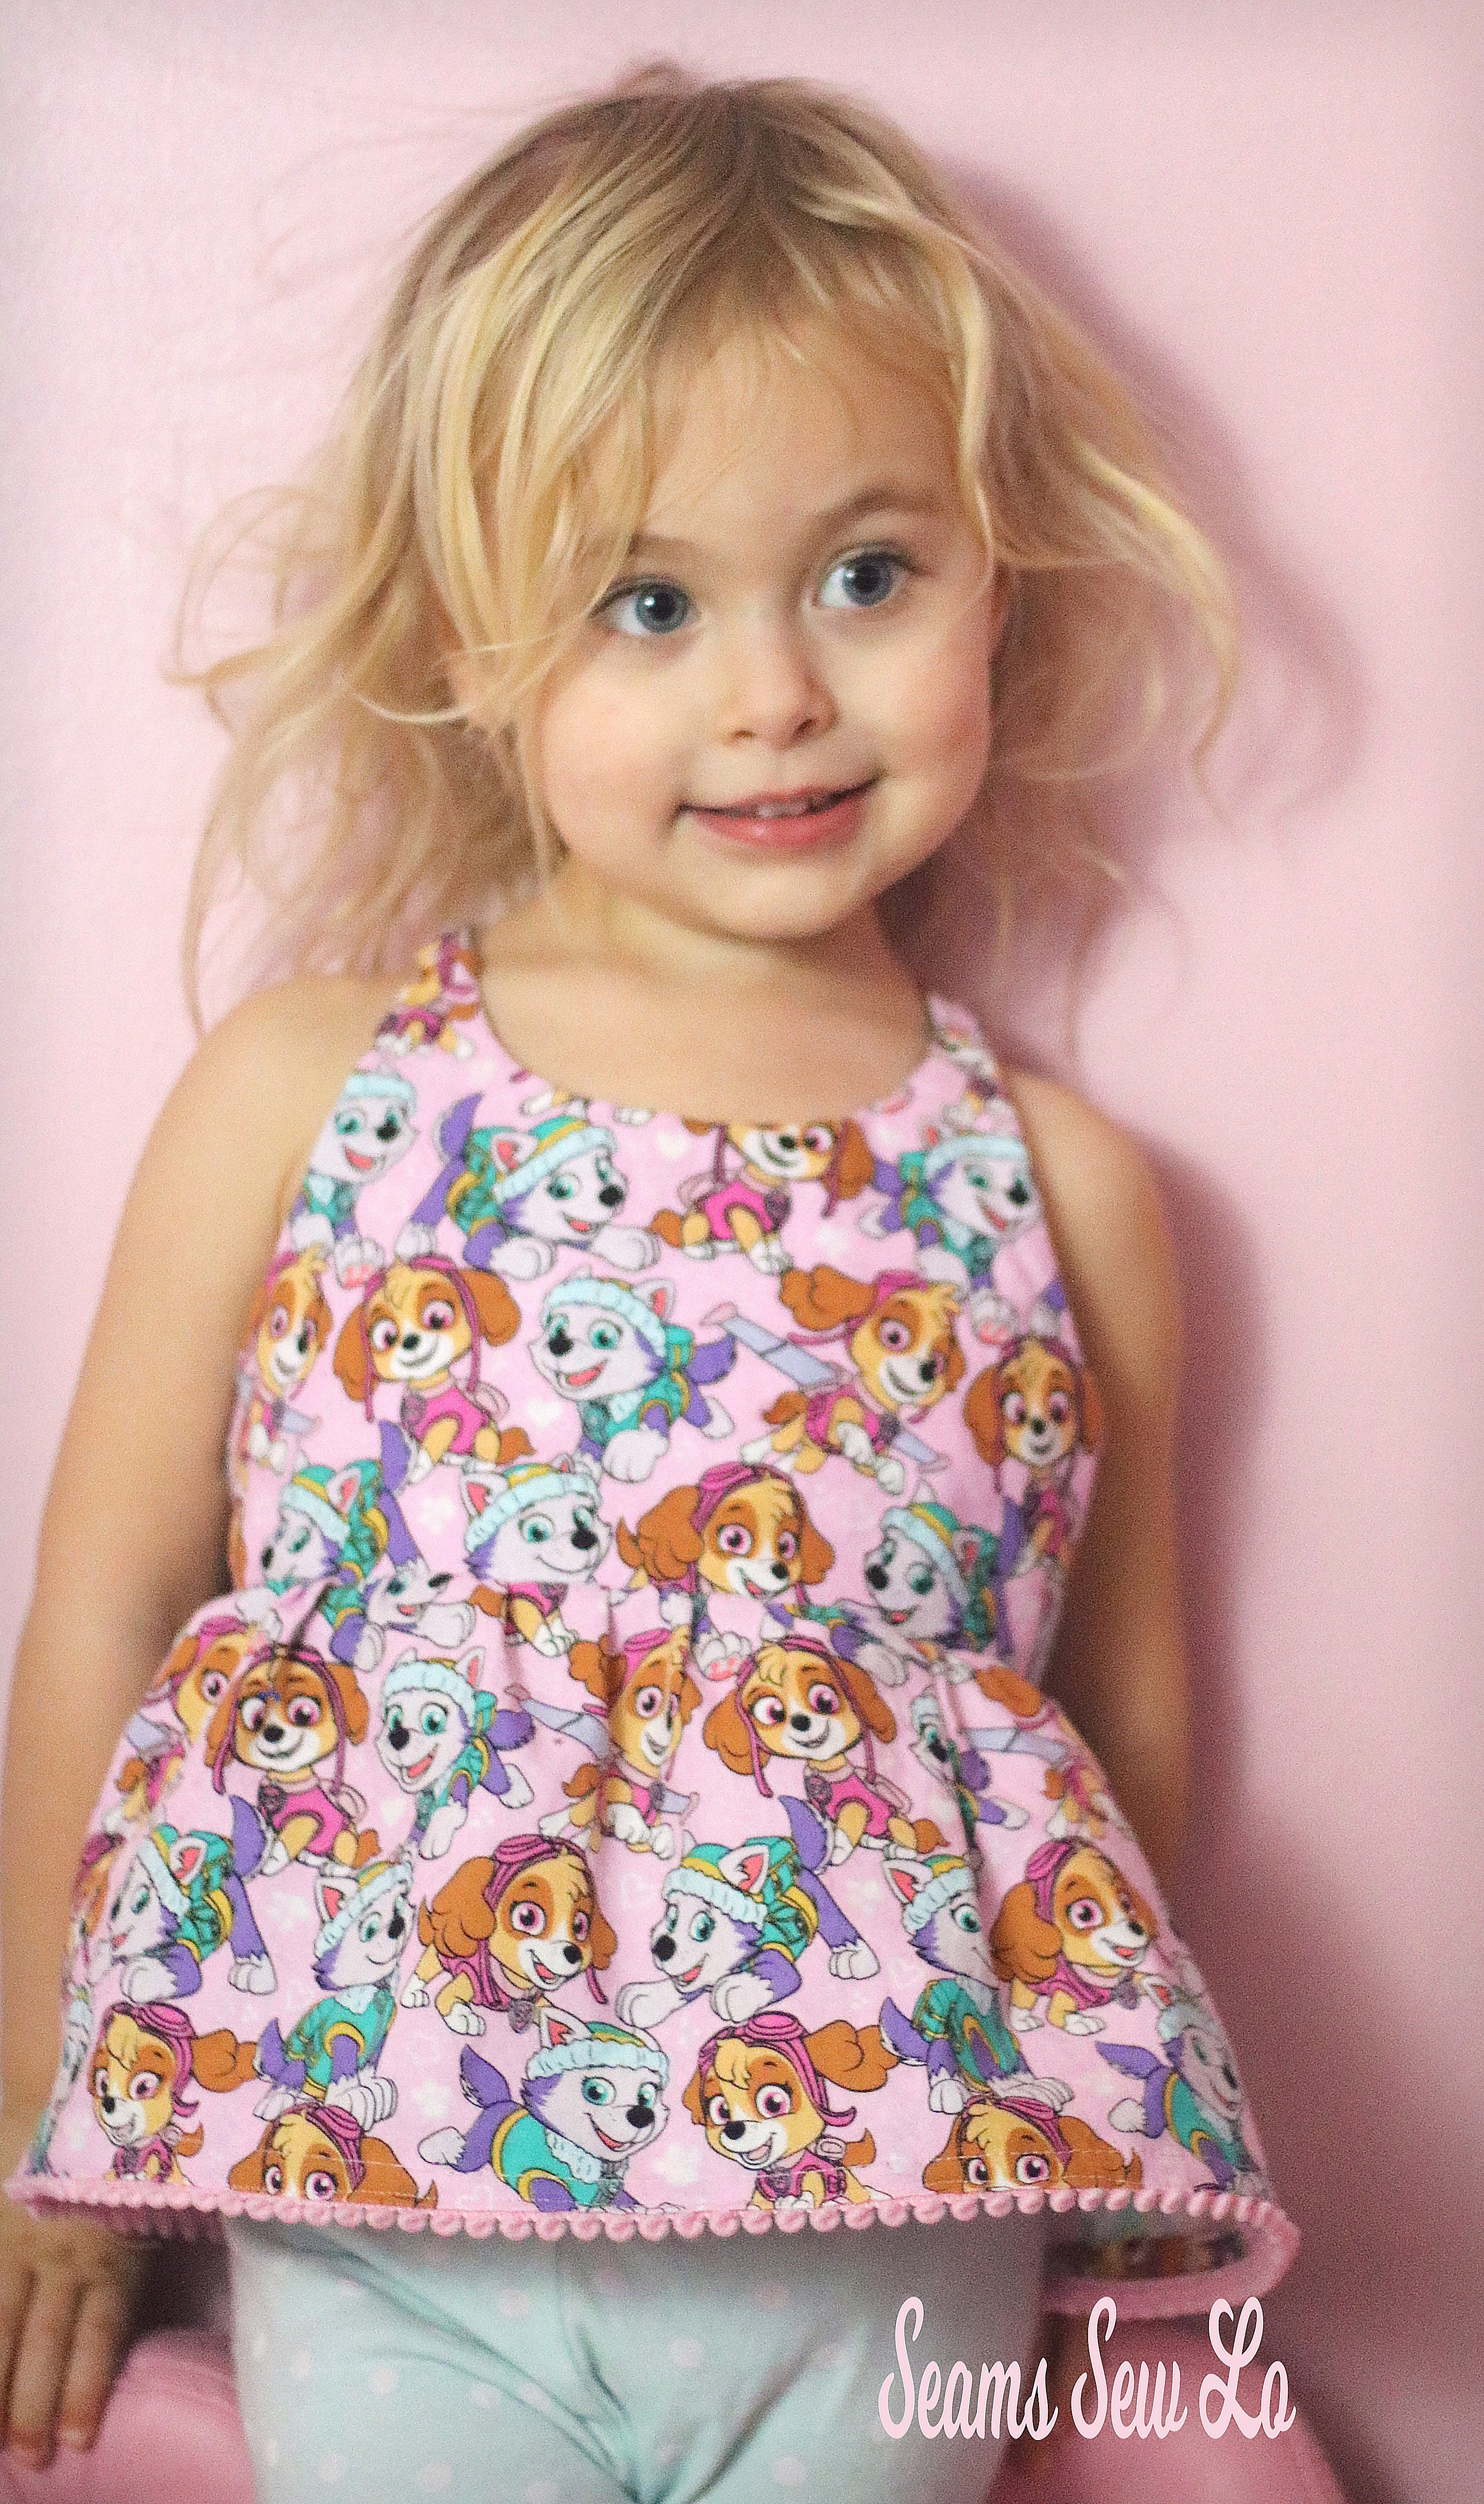 c6952106ad Petite Stitchery Periwinkle girls woven tunic in pink paw patrol Skye and  Everest fabric pink pom pom trim